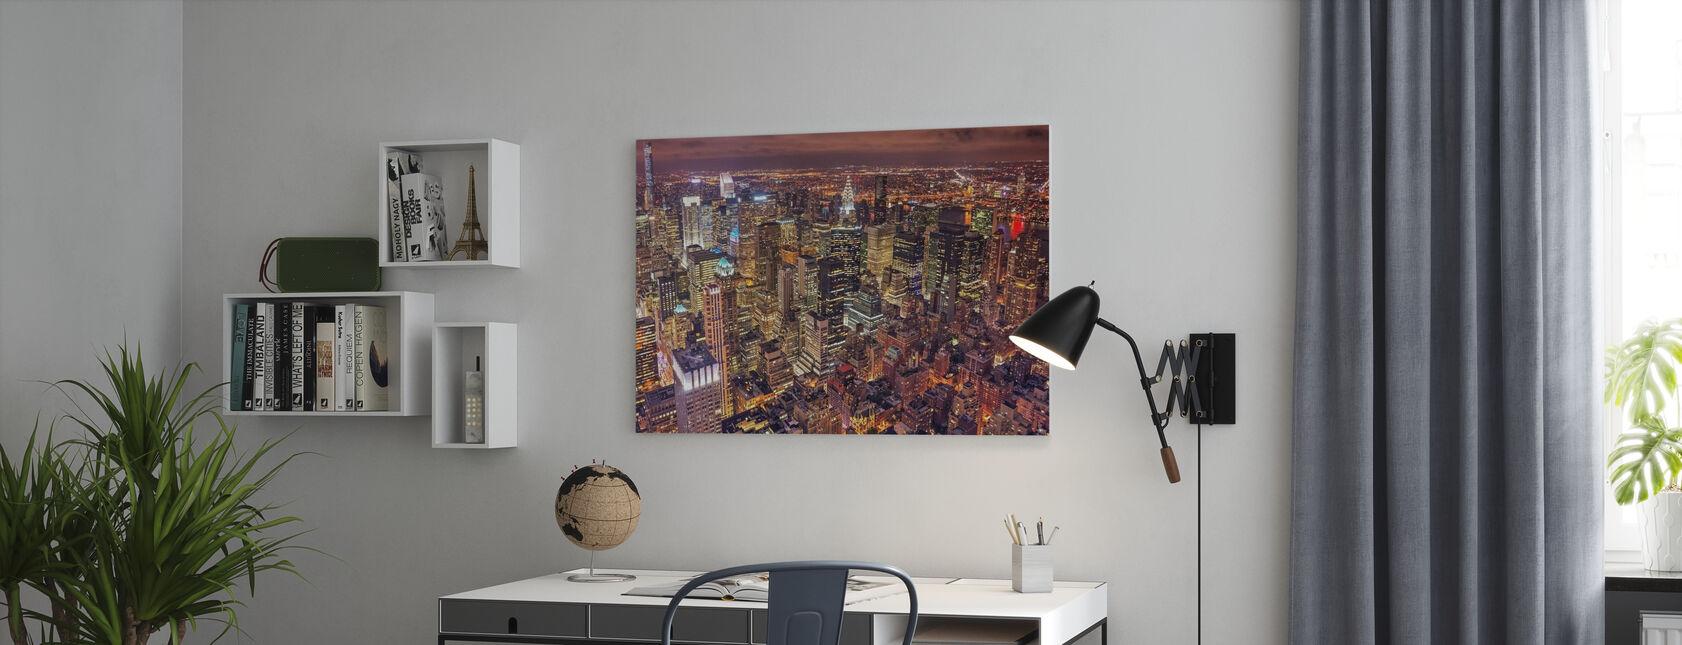 Night Life - Canvas print - Office